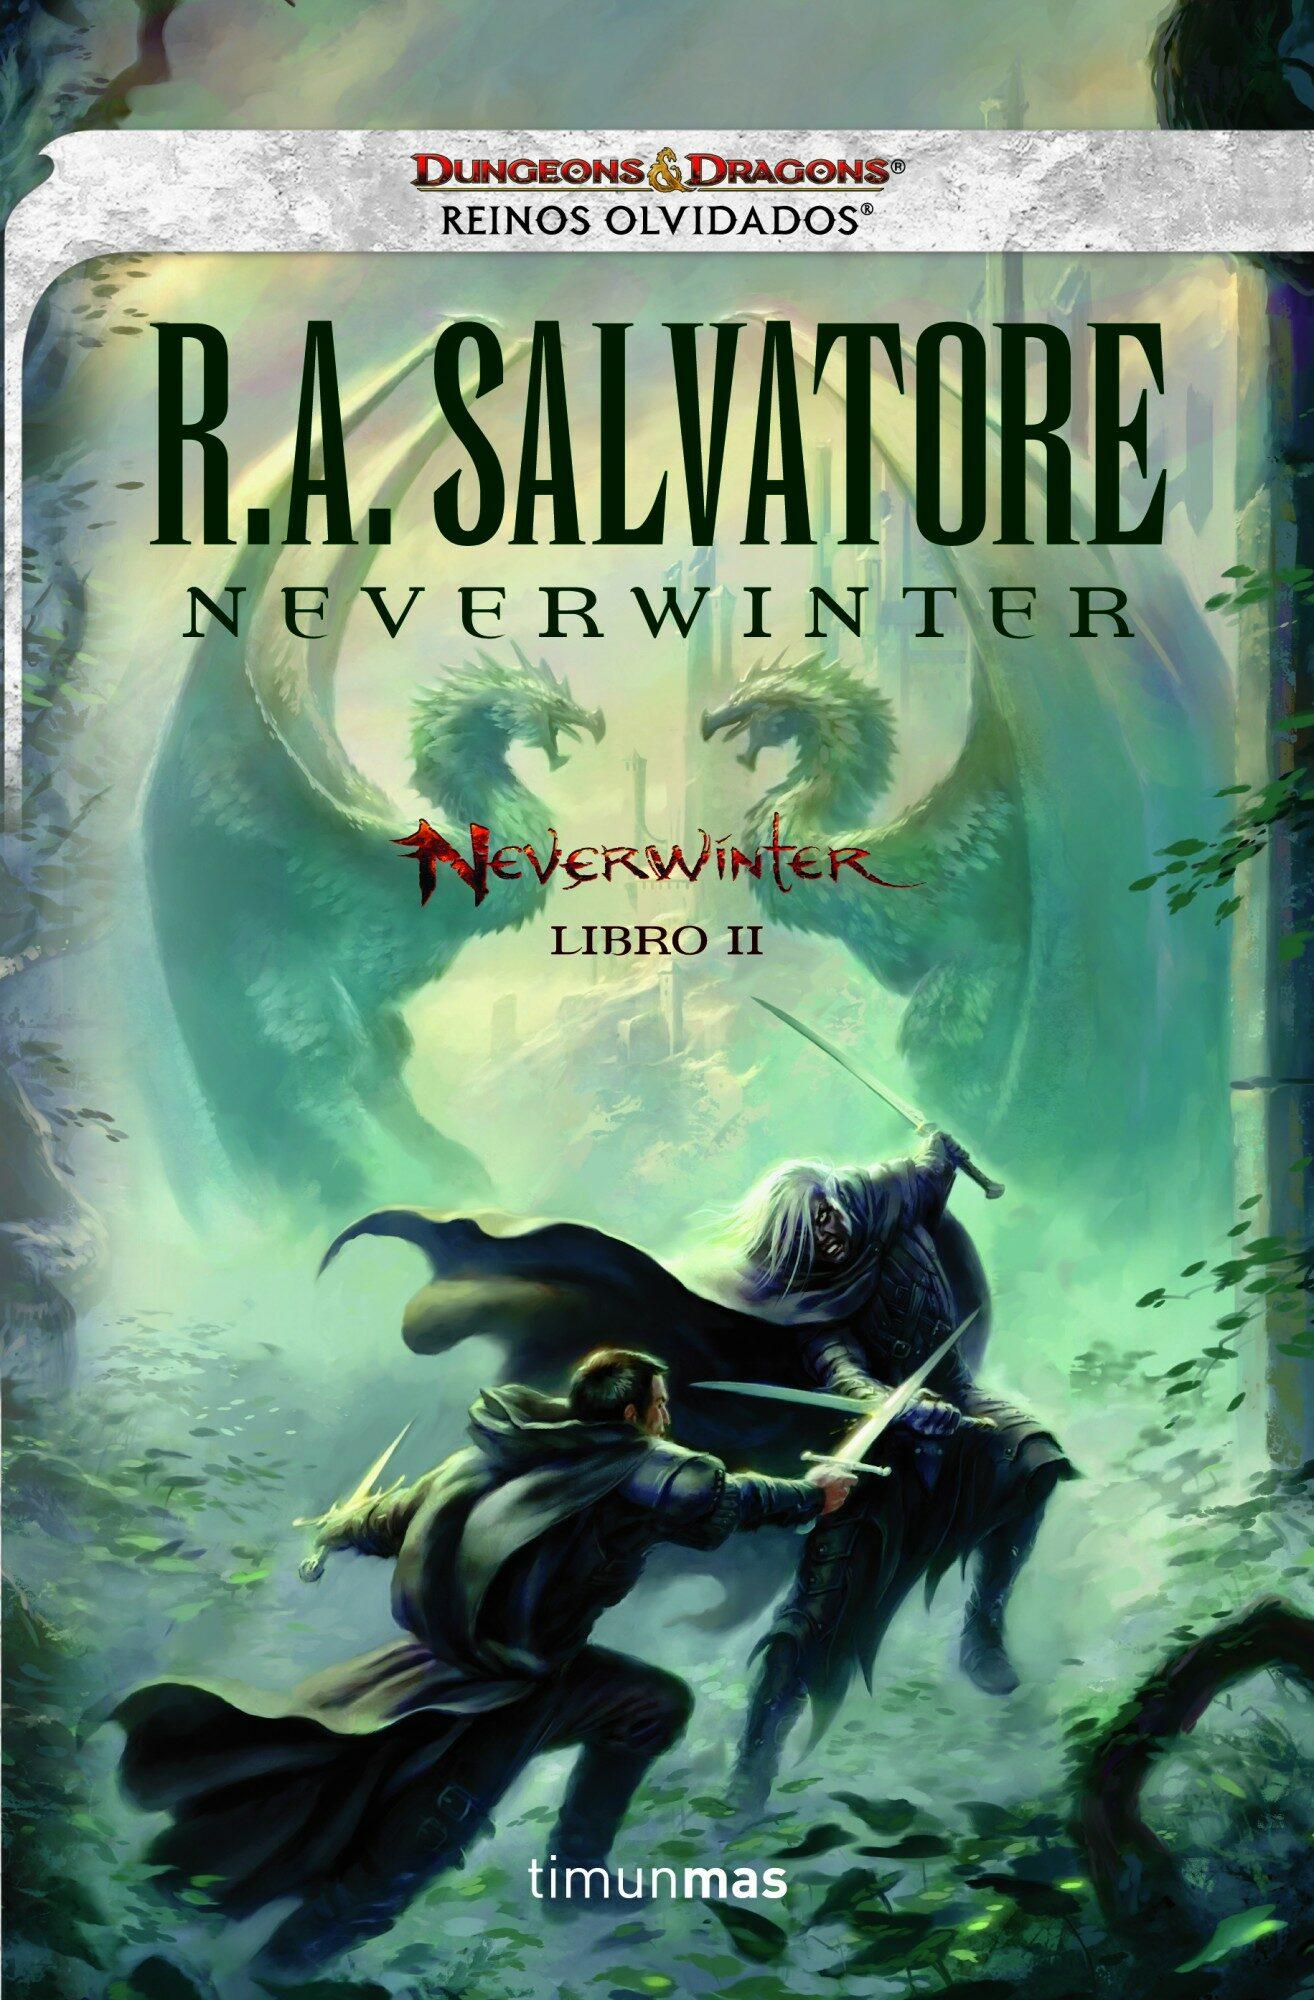 Neverwinter  (libro Ii - Reinos Olvidados) por R.a. Salvatore